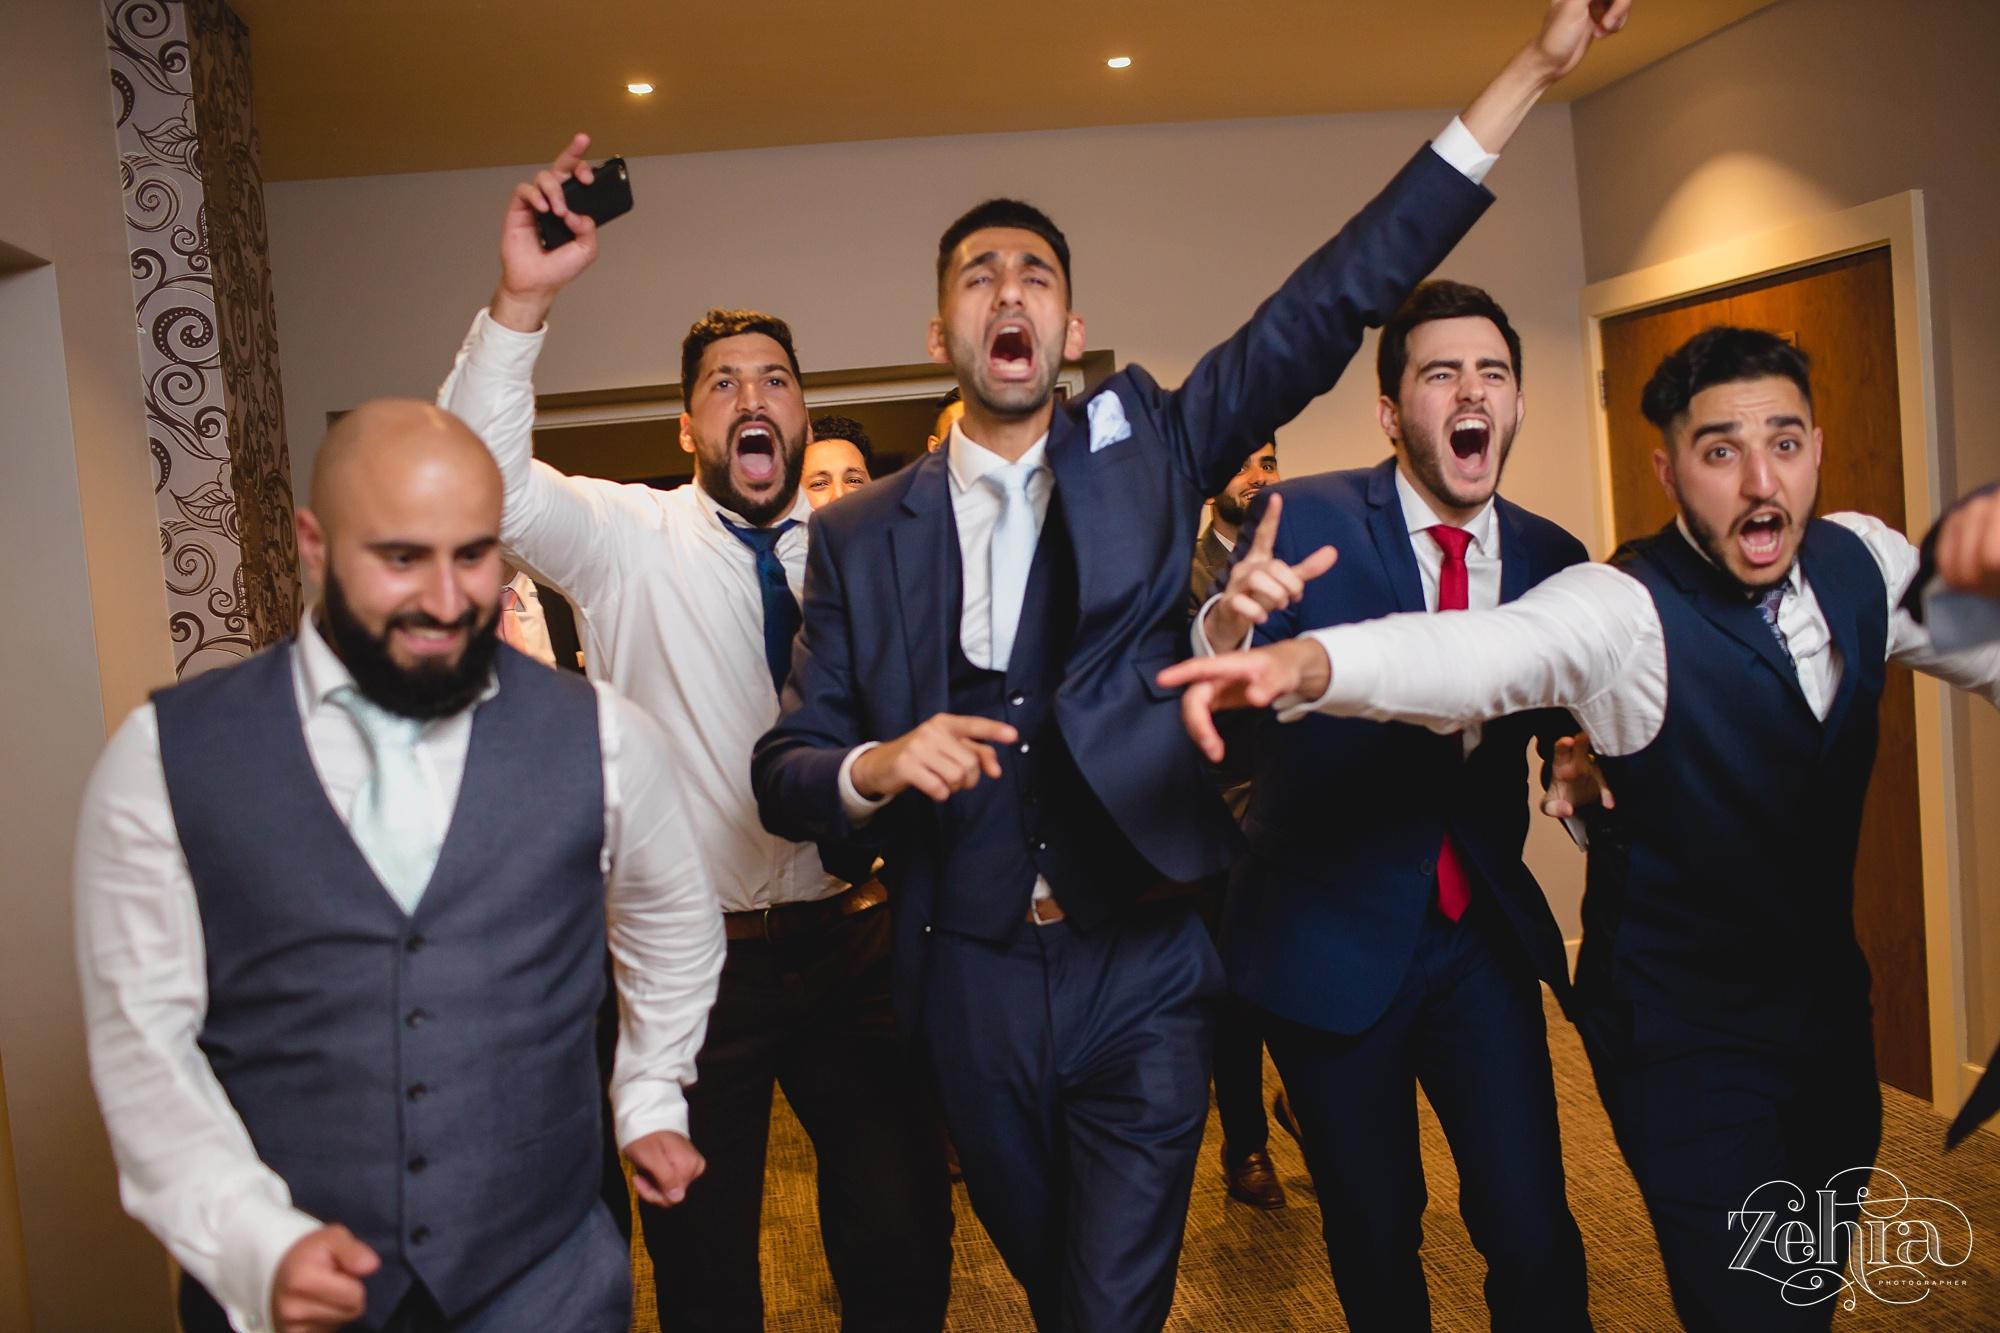 zehra photographer mere cheshire wedding_0073.jpg